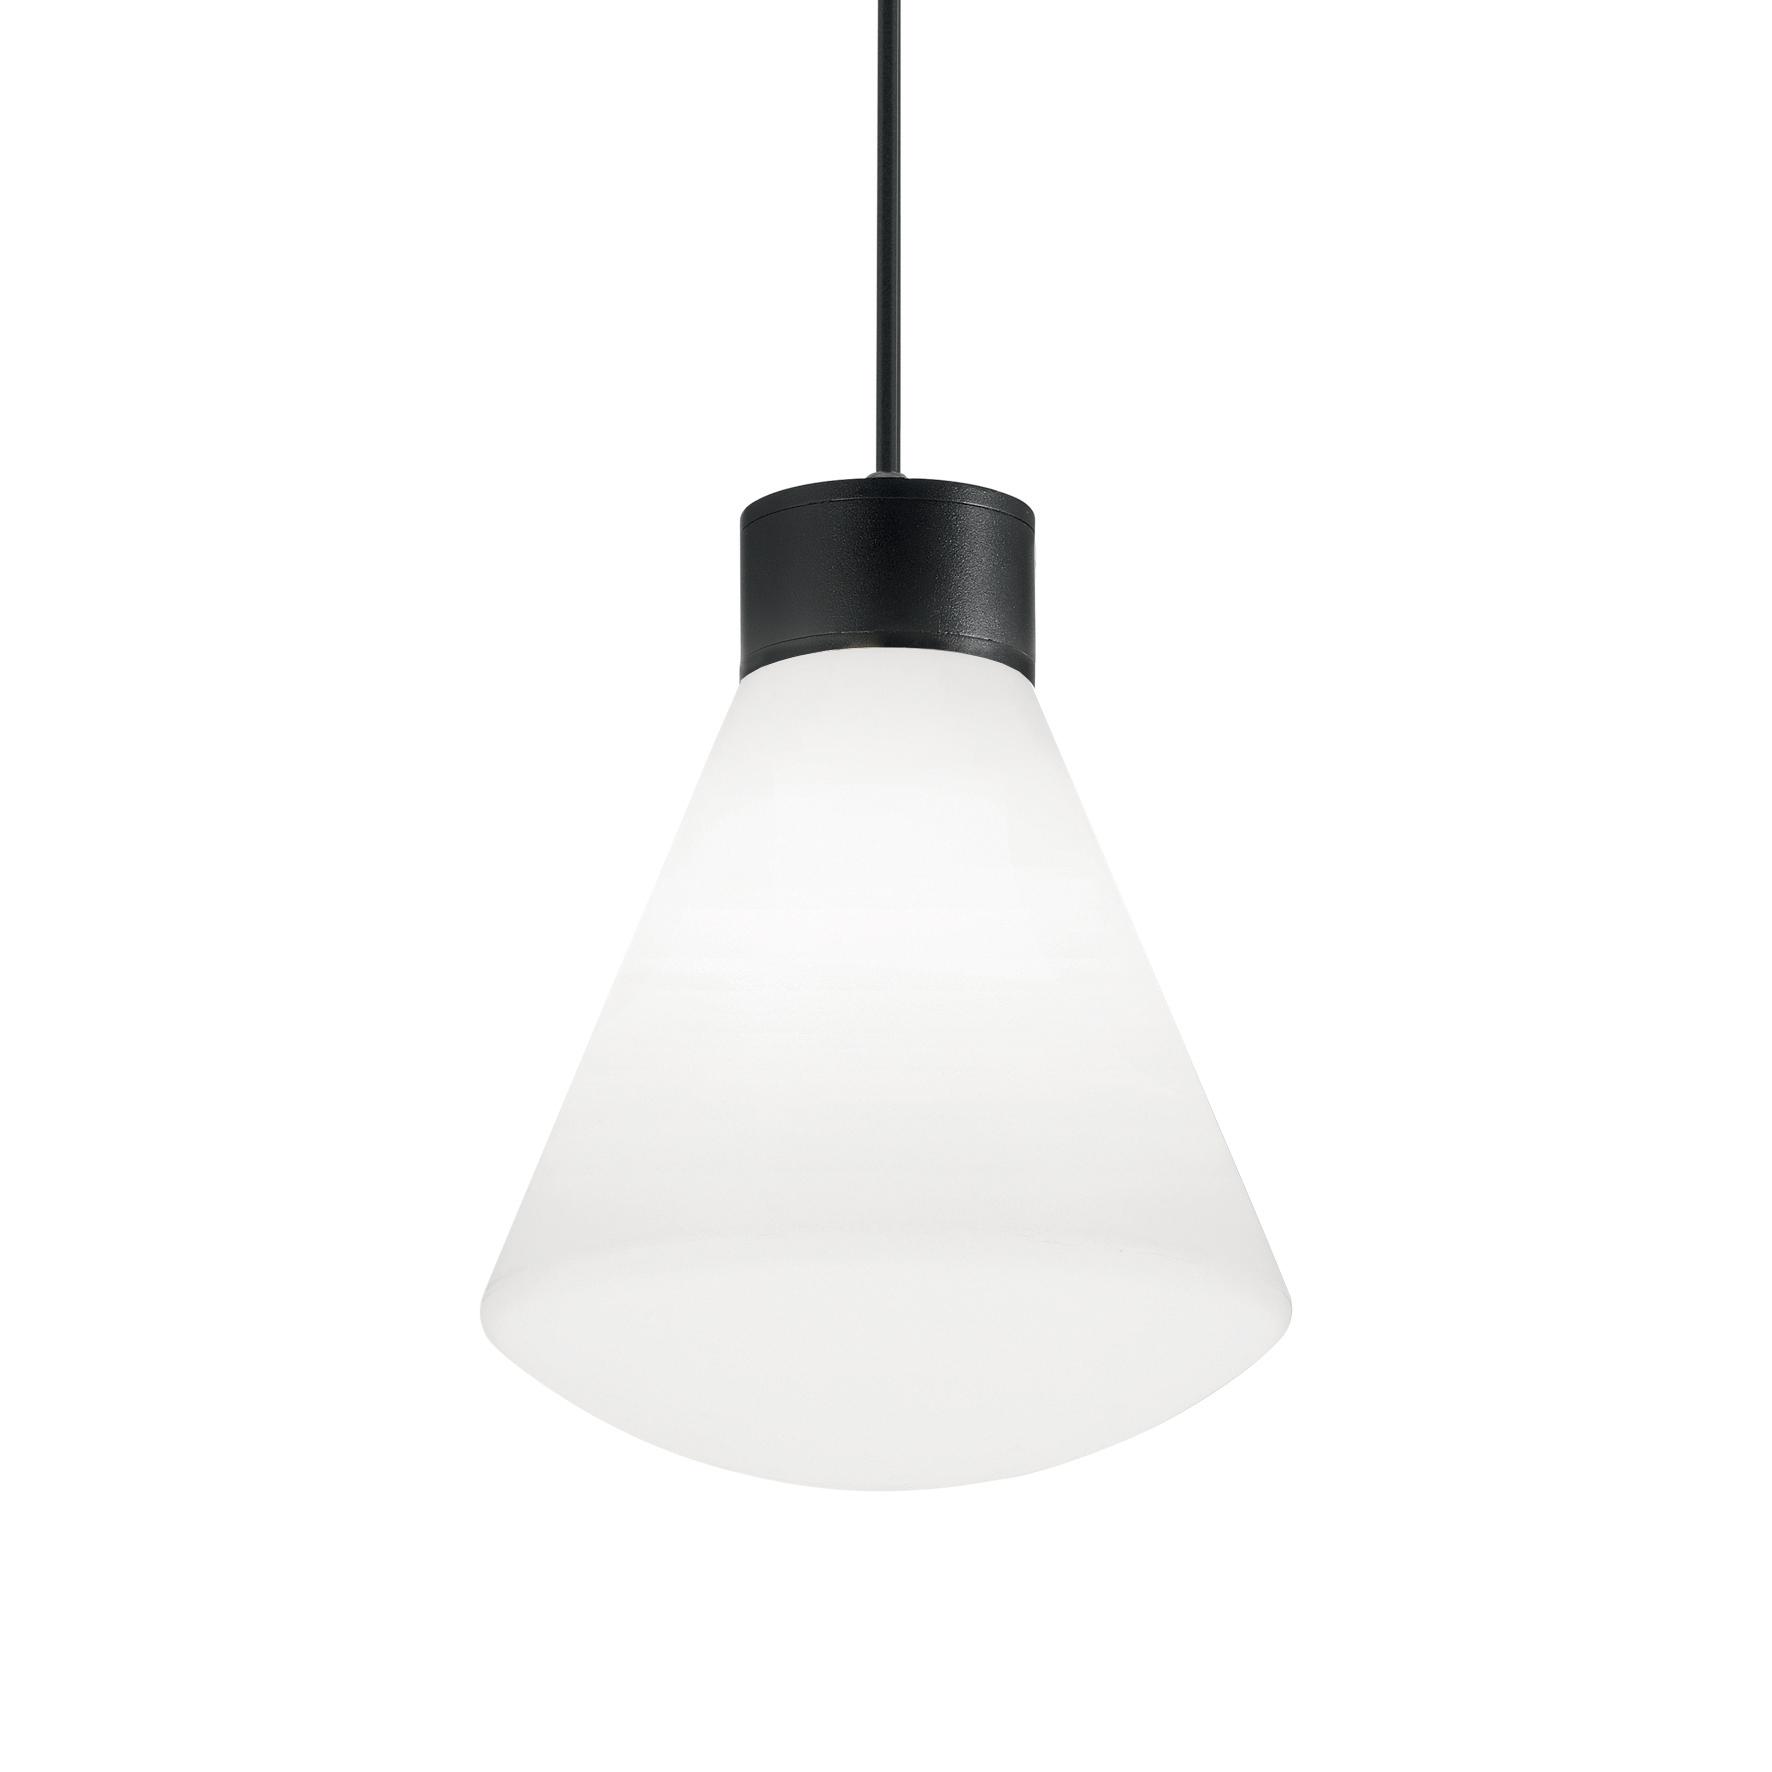 Lustra Ouverture SP1 Black